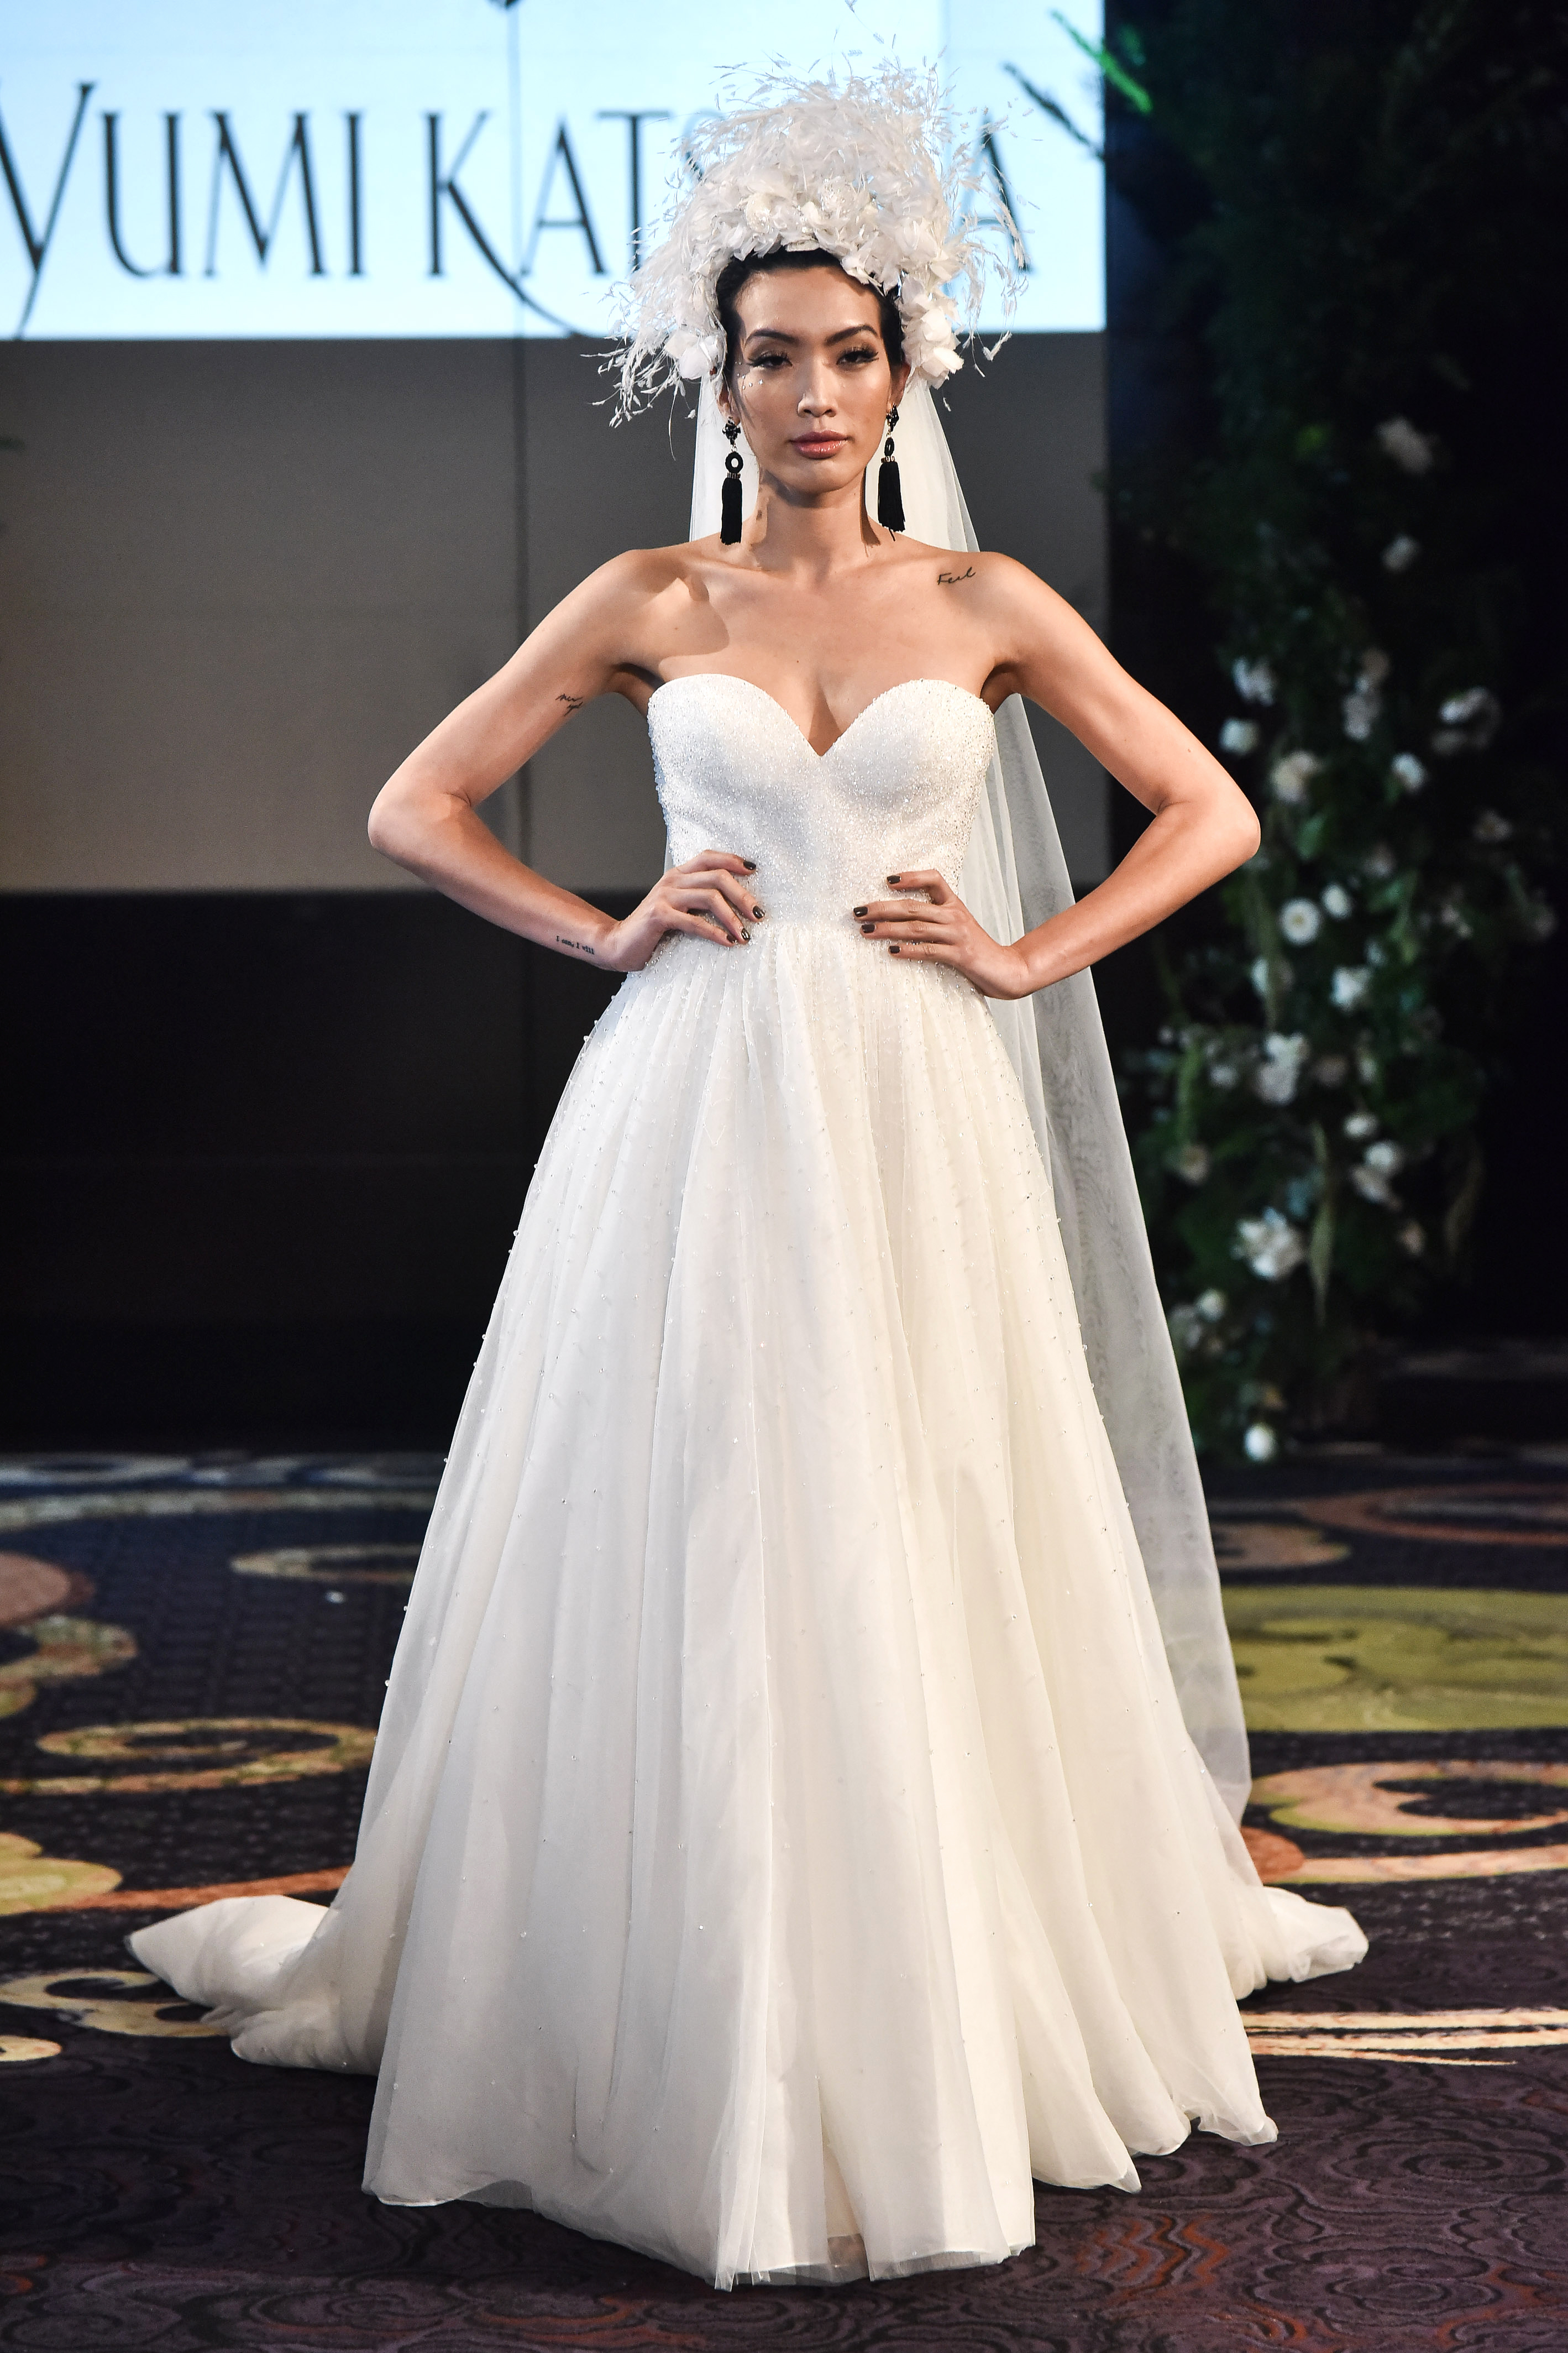 yumi katsura fall 2018 sweetheart a-line wedding dress